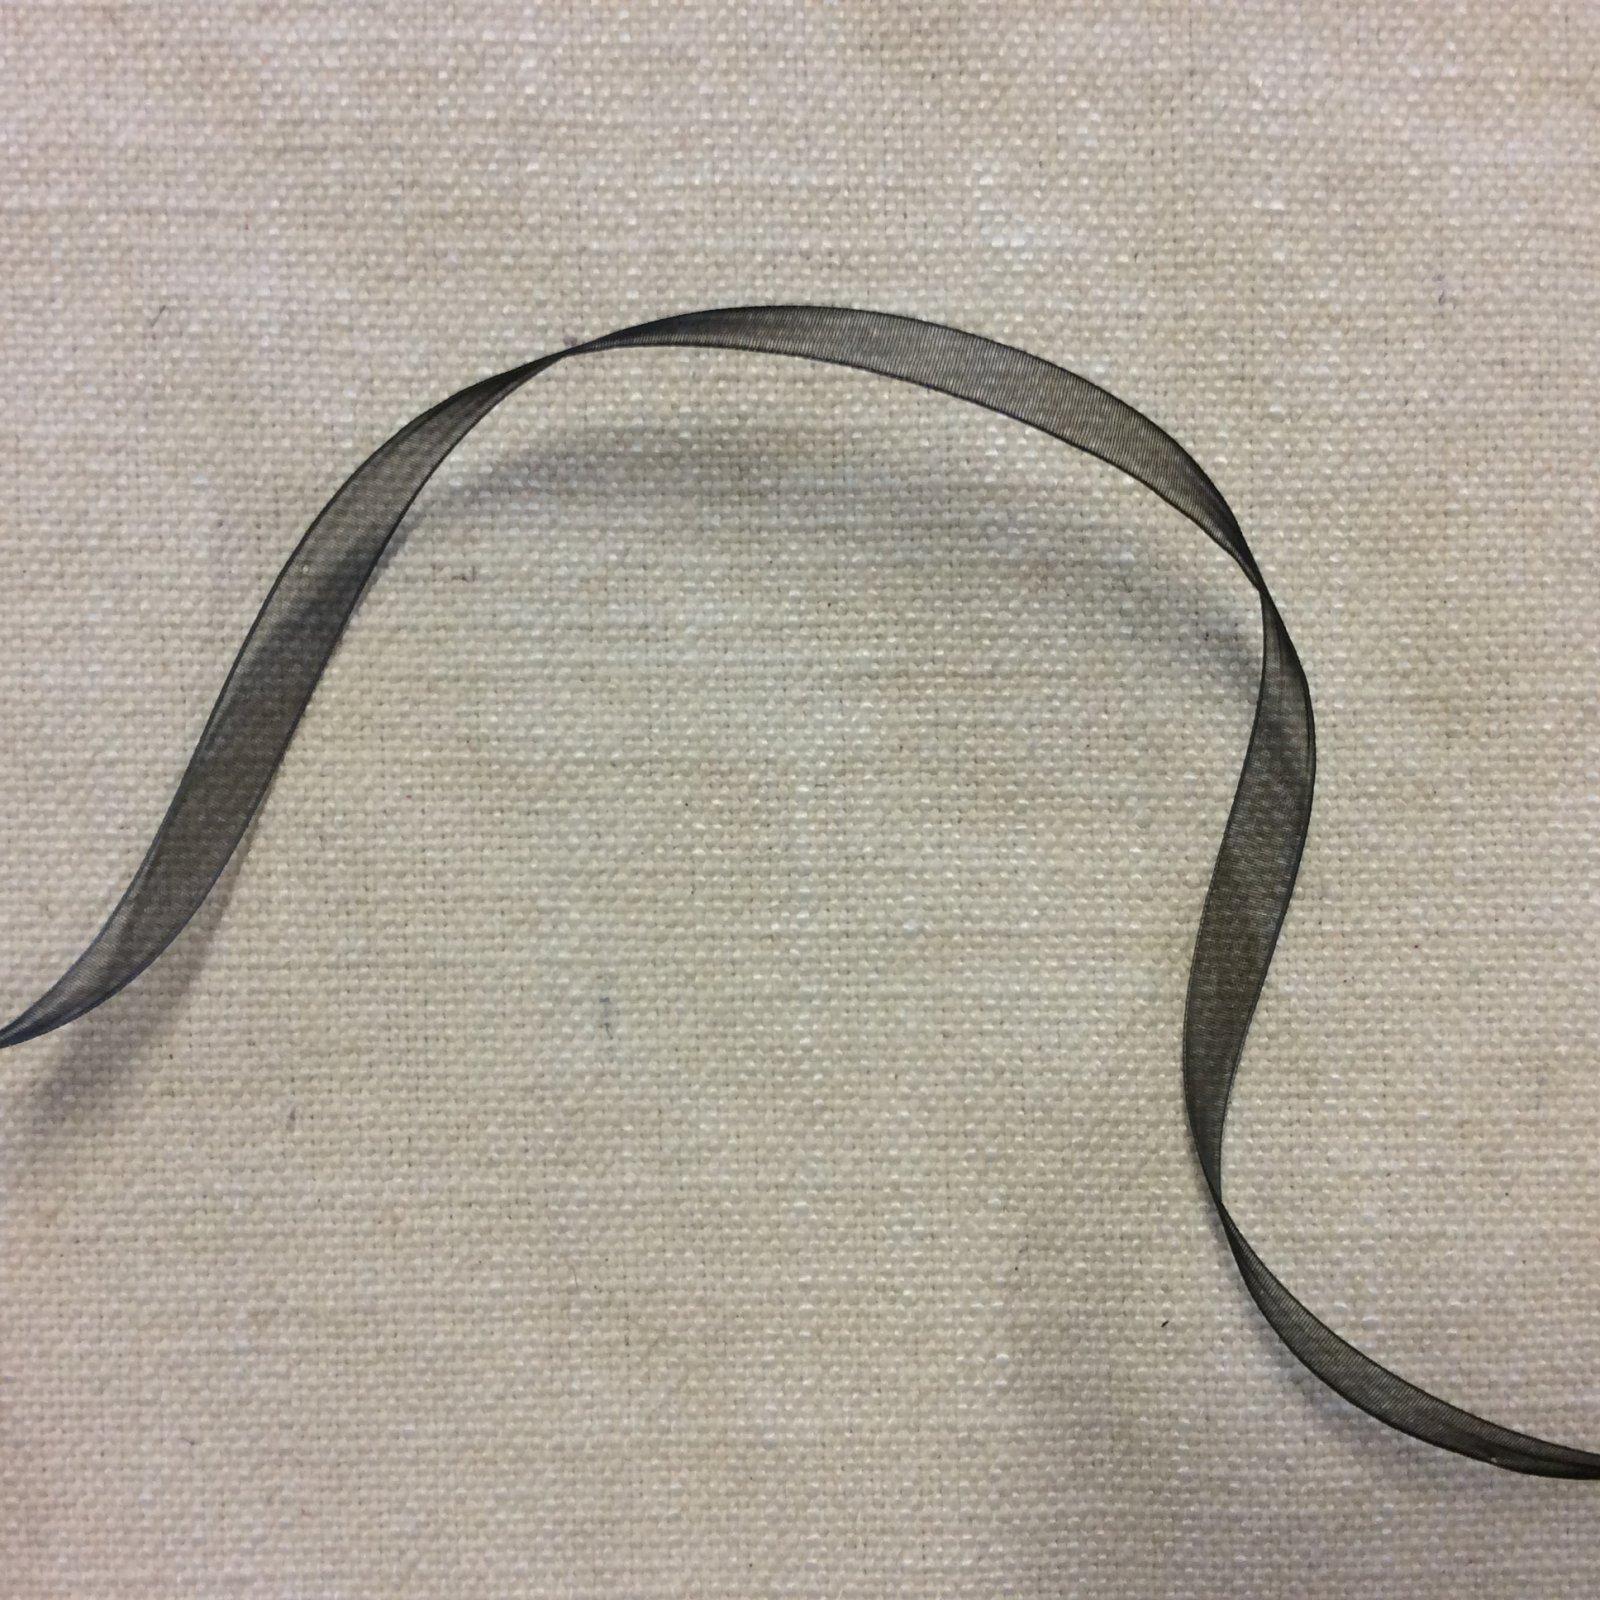 Organza Ribbon 3/8 Lightweight Black Trim Ribbon RIB1214